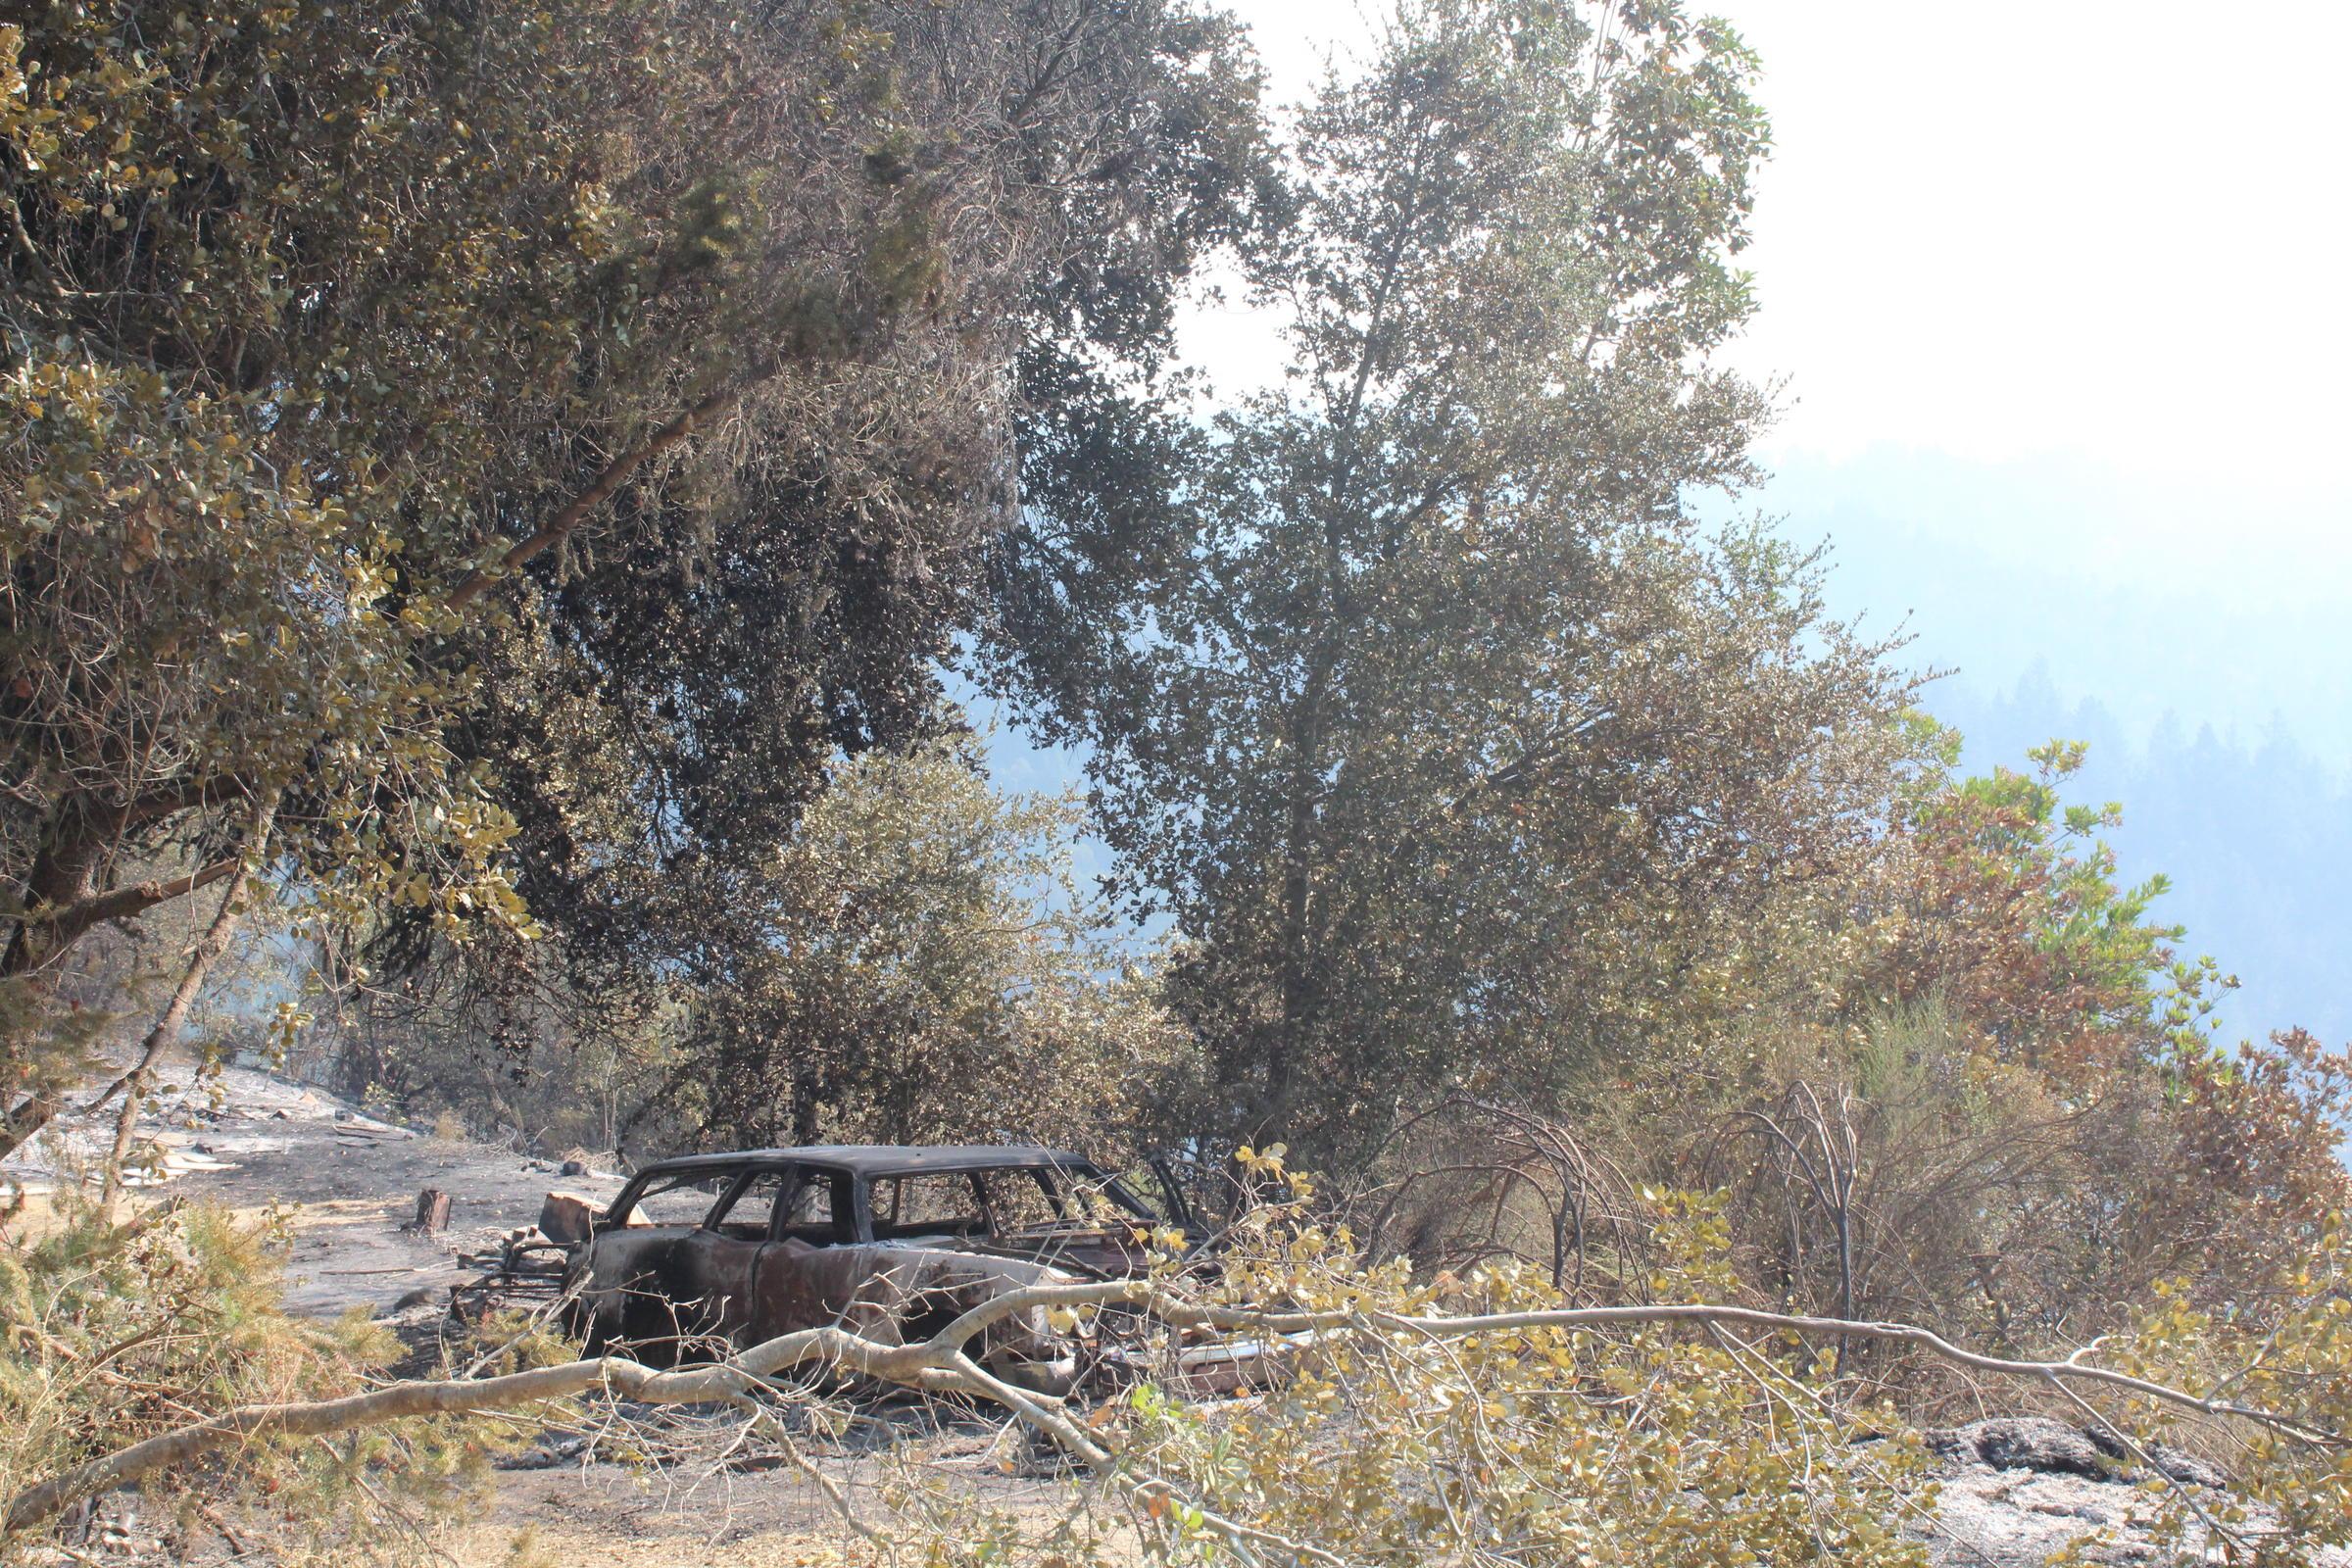 Bear Fire origin may be location of former chop shop